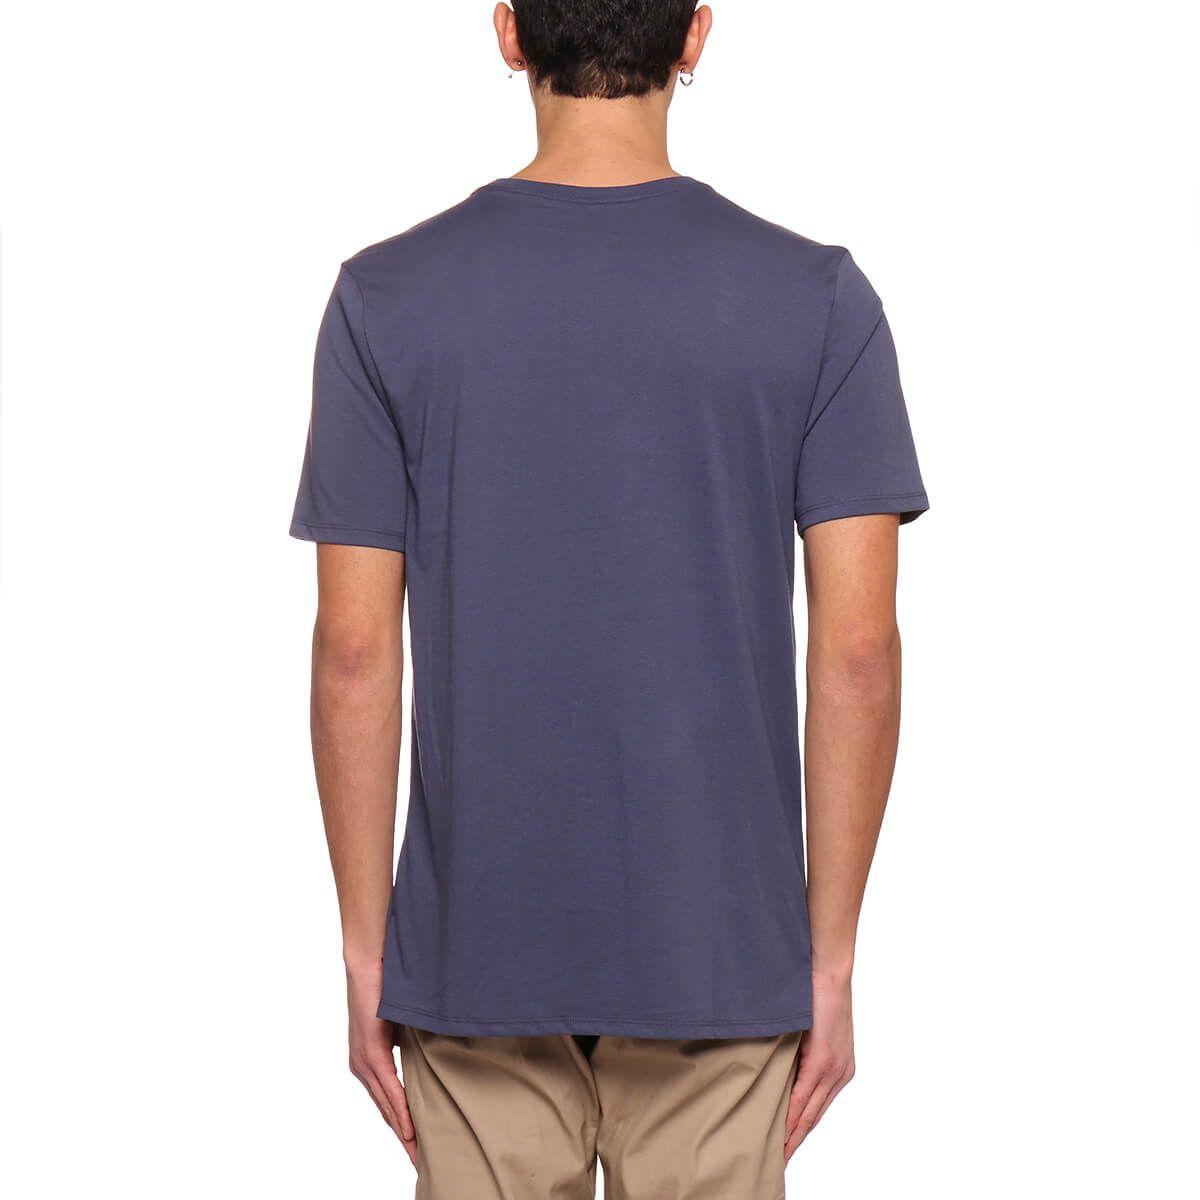 Clearance Marketable Cheap Sale Top Quality TEE AIR 2 - TOPWEAR - T-shirts Nike Marketable Sale Online w1crF7Qg